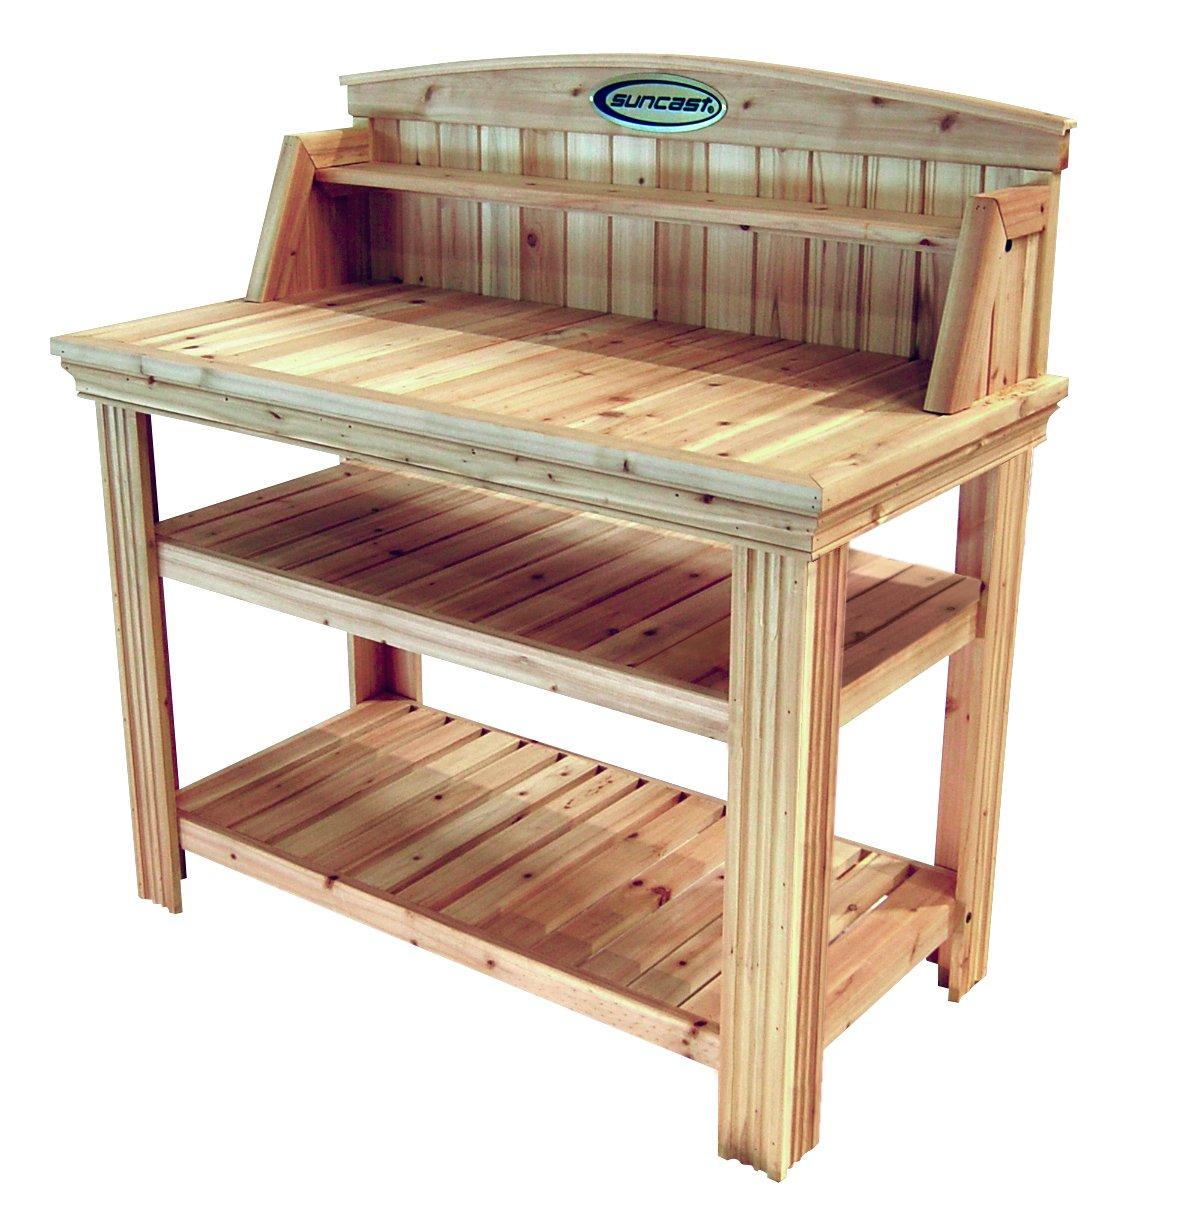 Suncast Cedar Freestanding Bench Ideal for Garages, Sheds, Basements - Organize Garden Equipment Supplies, Pots, Watering Cans - Hardware Included